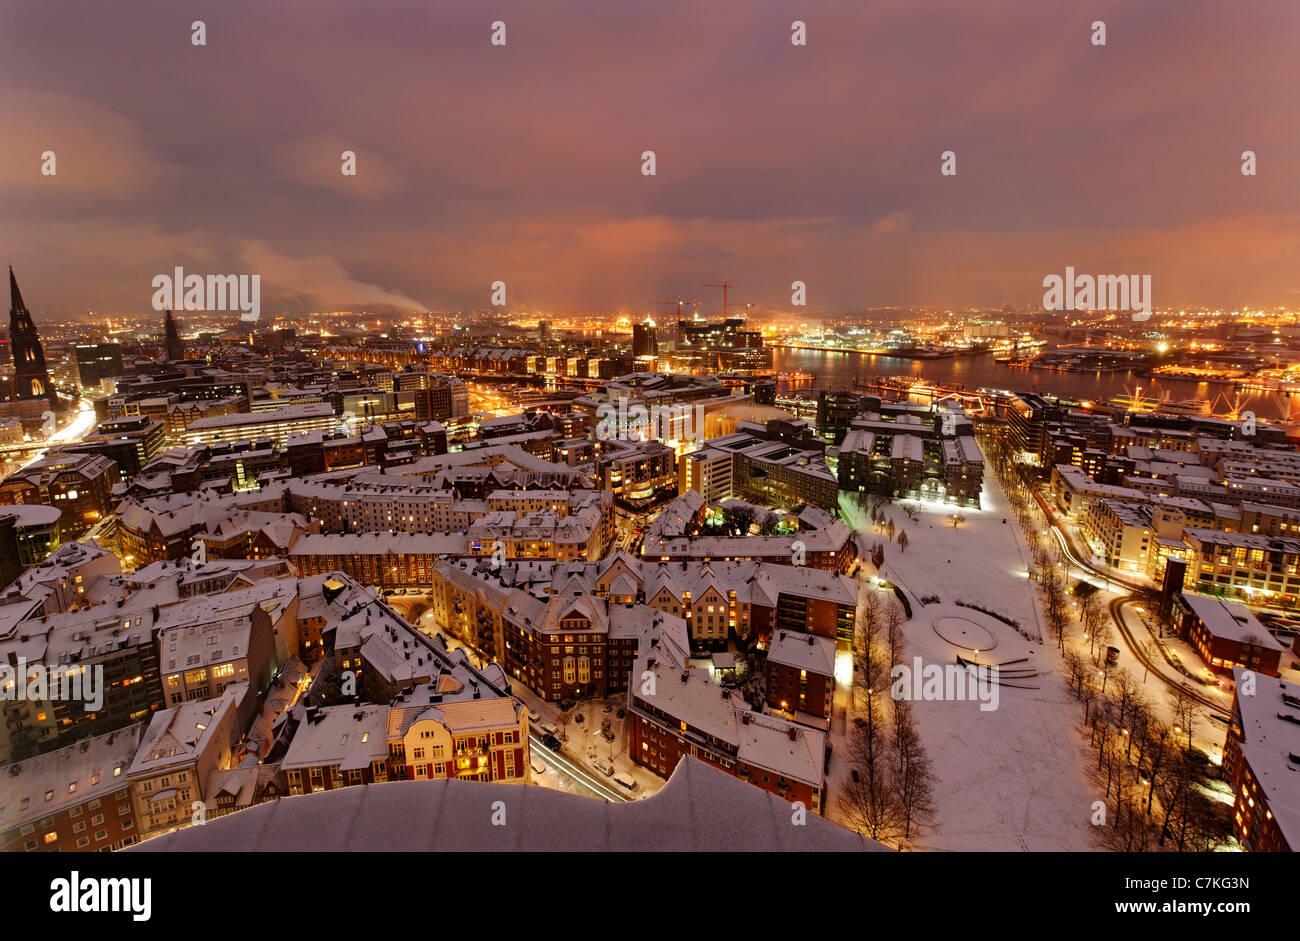 City center, snow, city, panorama, Hamburg, Germany, Europe - Stock Image